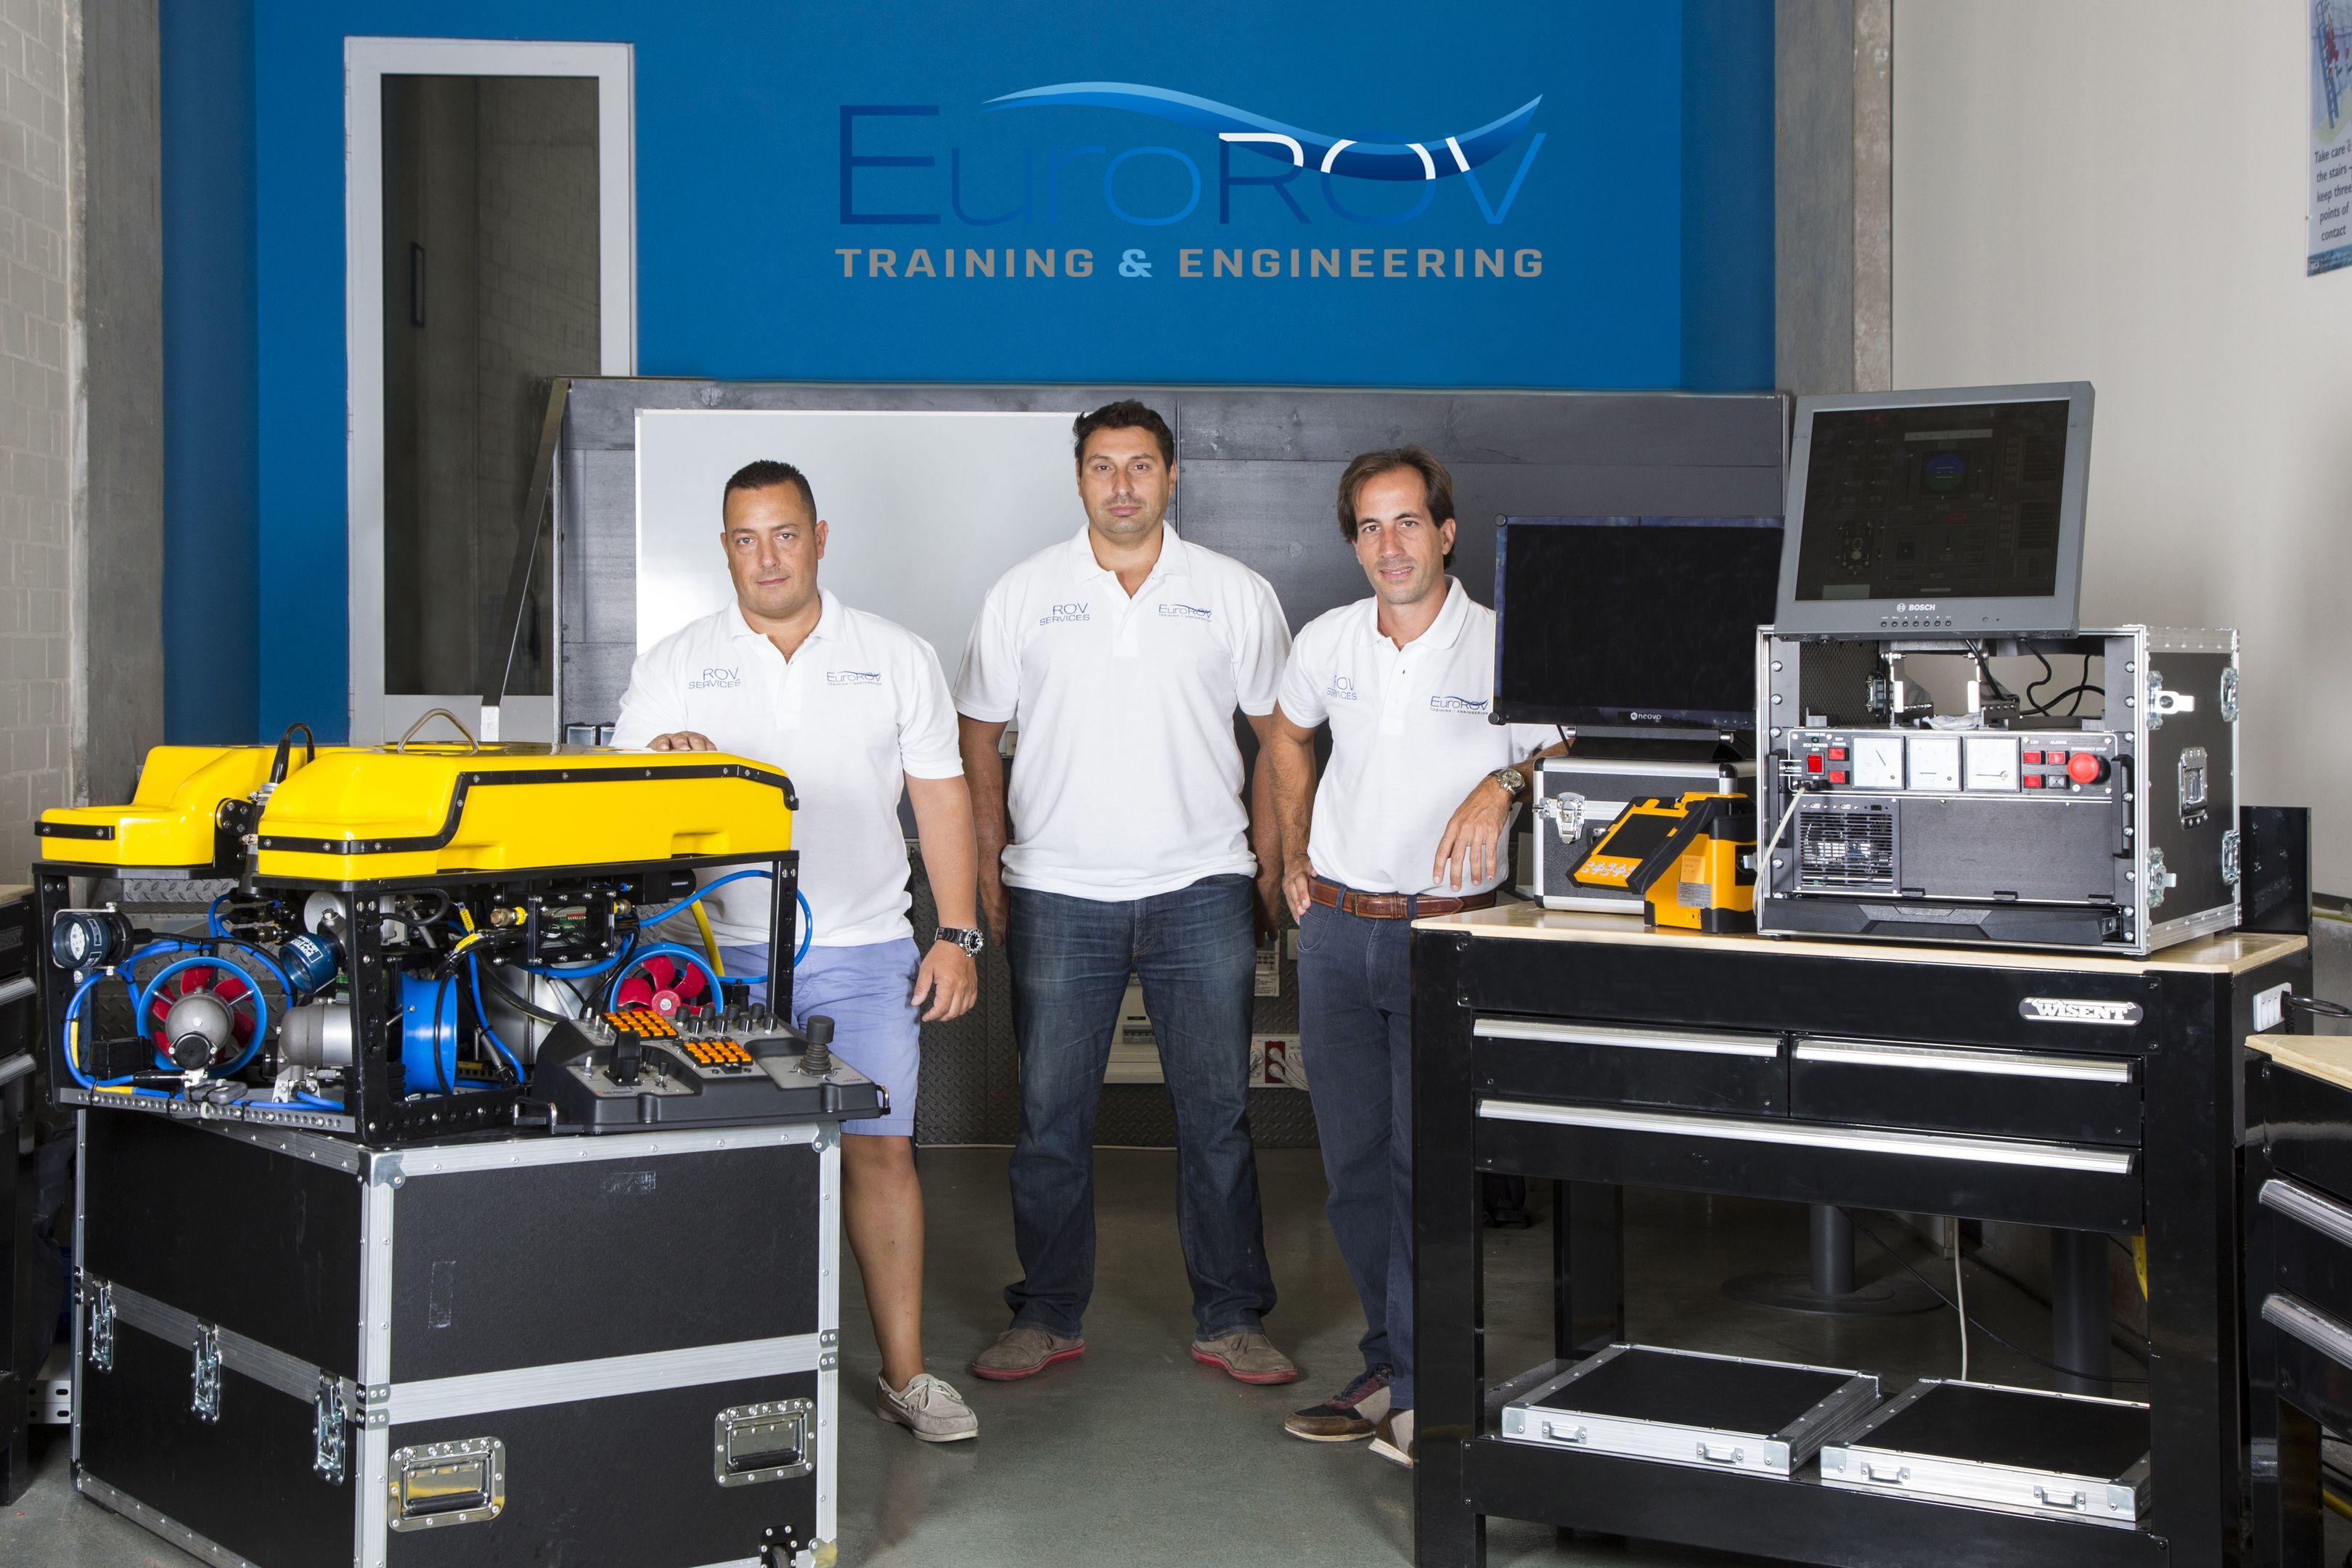 EuroROV co-founders, Sebastain Ruiz, Adrian Tramallino, Sebastian Ruggirello